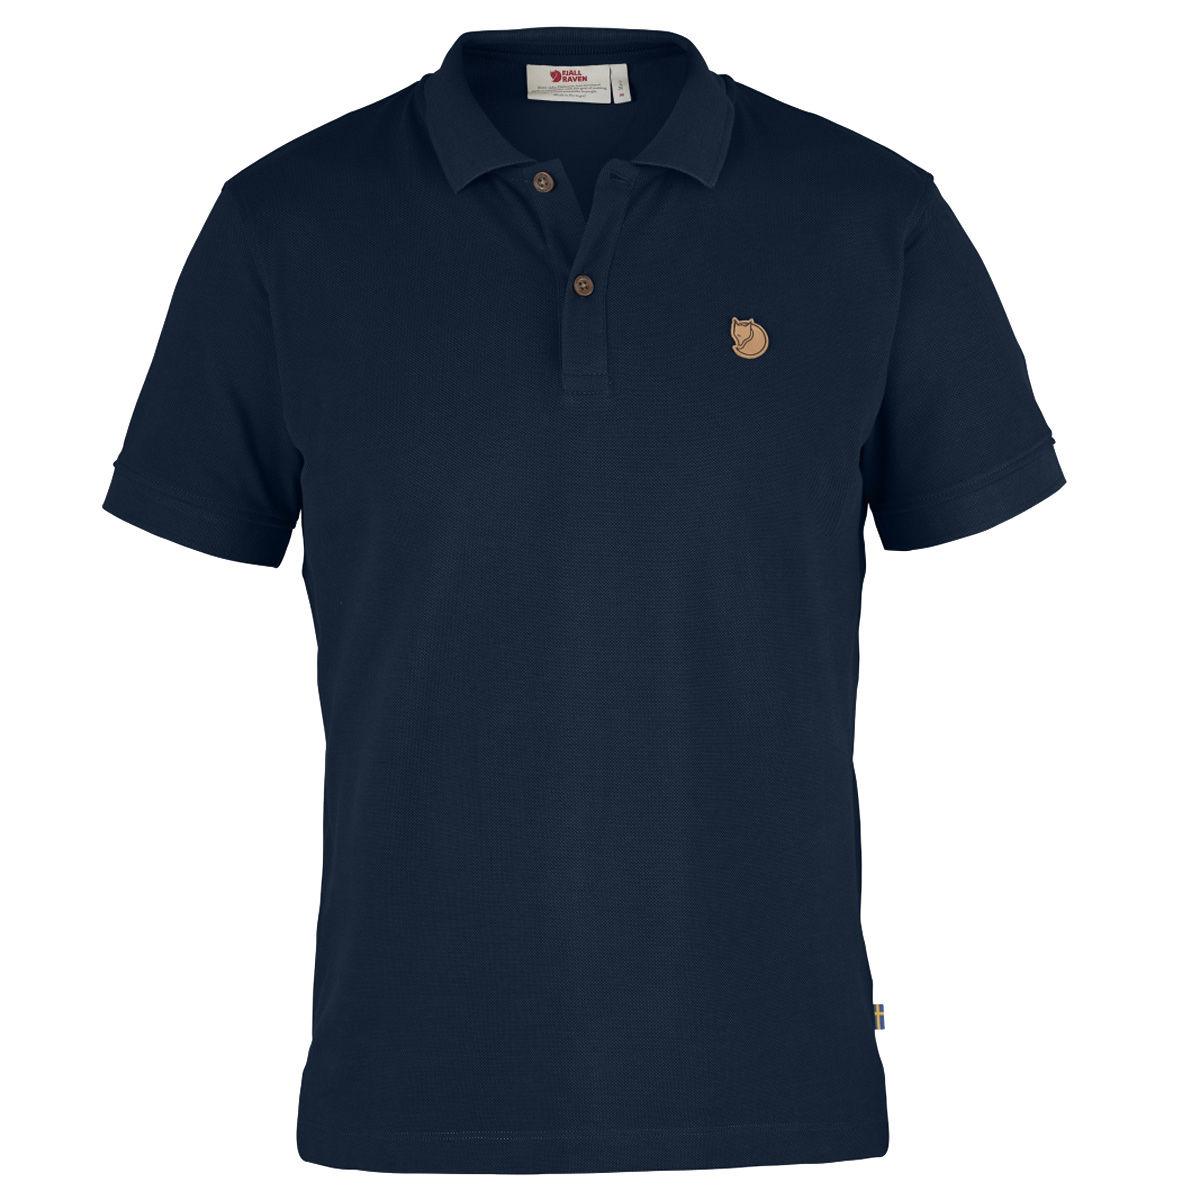 Fjallraven Ovik Polo Shirt - Navy